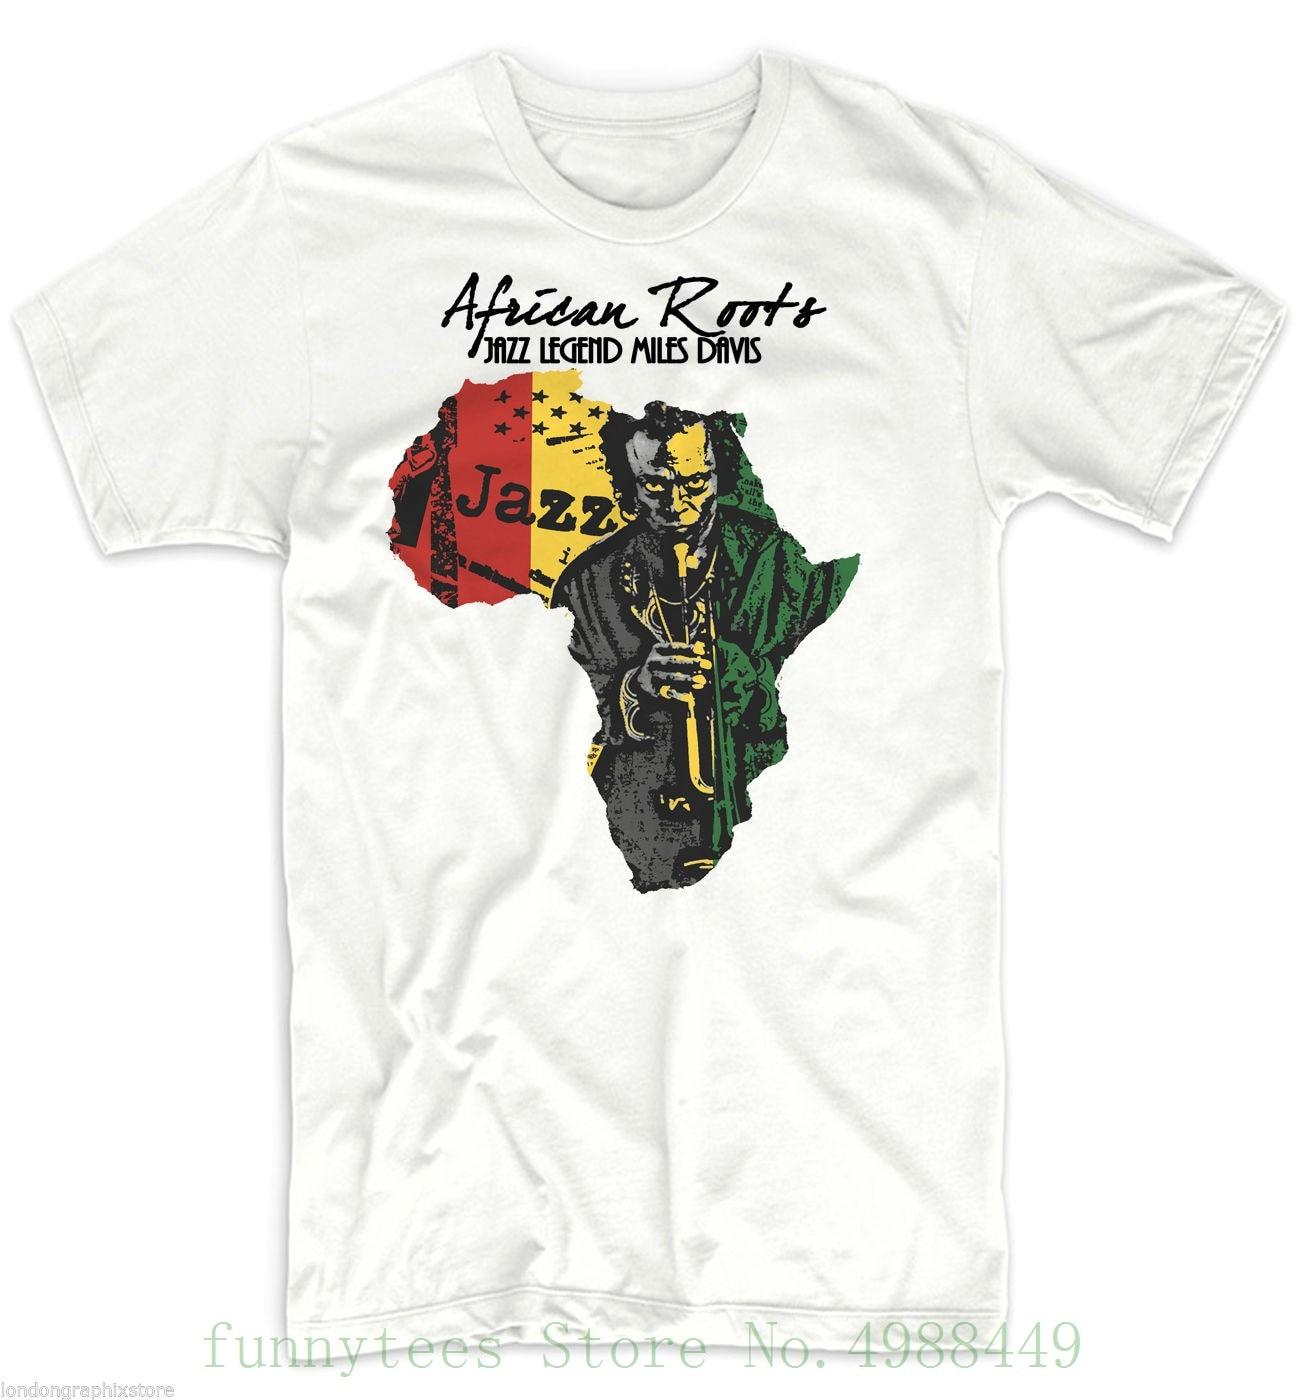 Camiseta de África, mapa africano, Historia Negra, Rastafari, camiseta blanca de algodón Reggae Miles Davis para verano para hombres